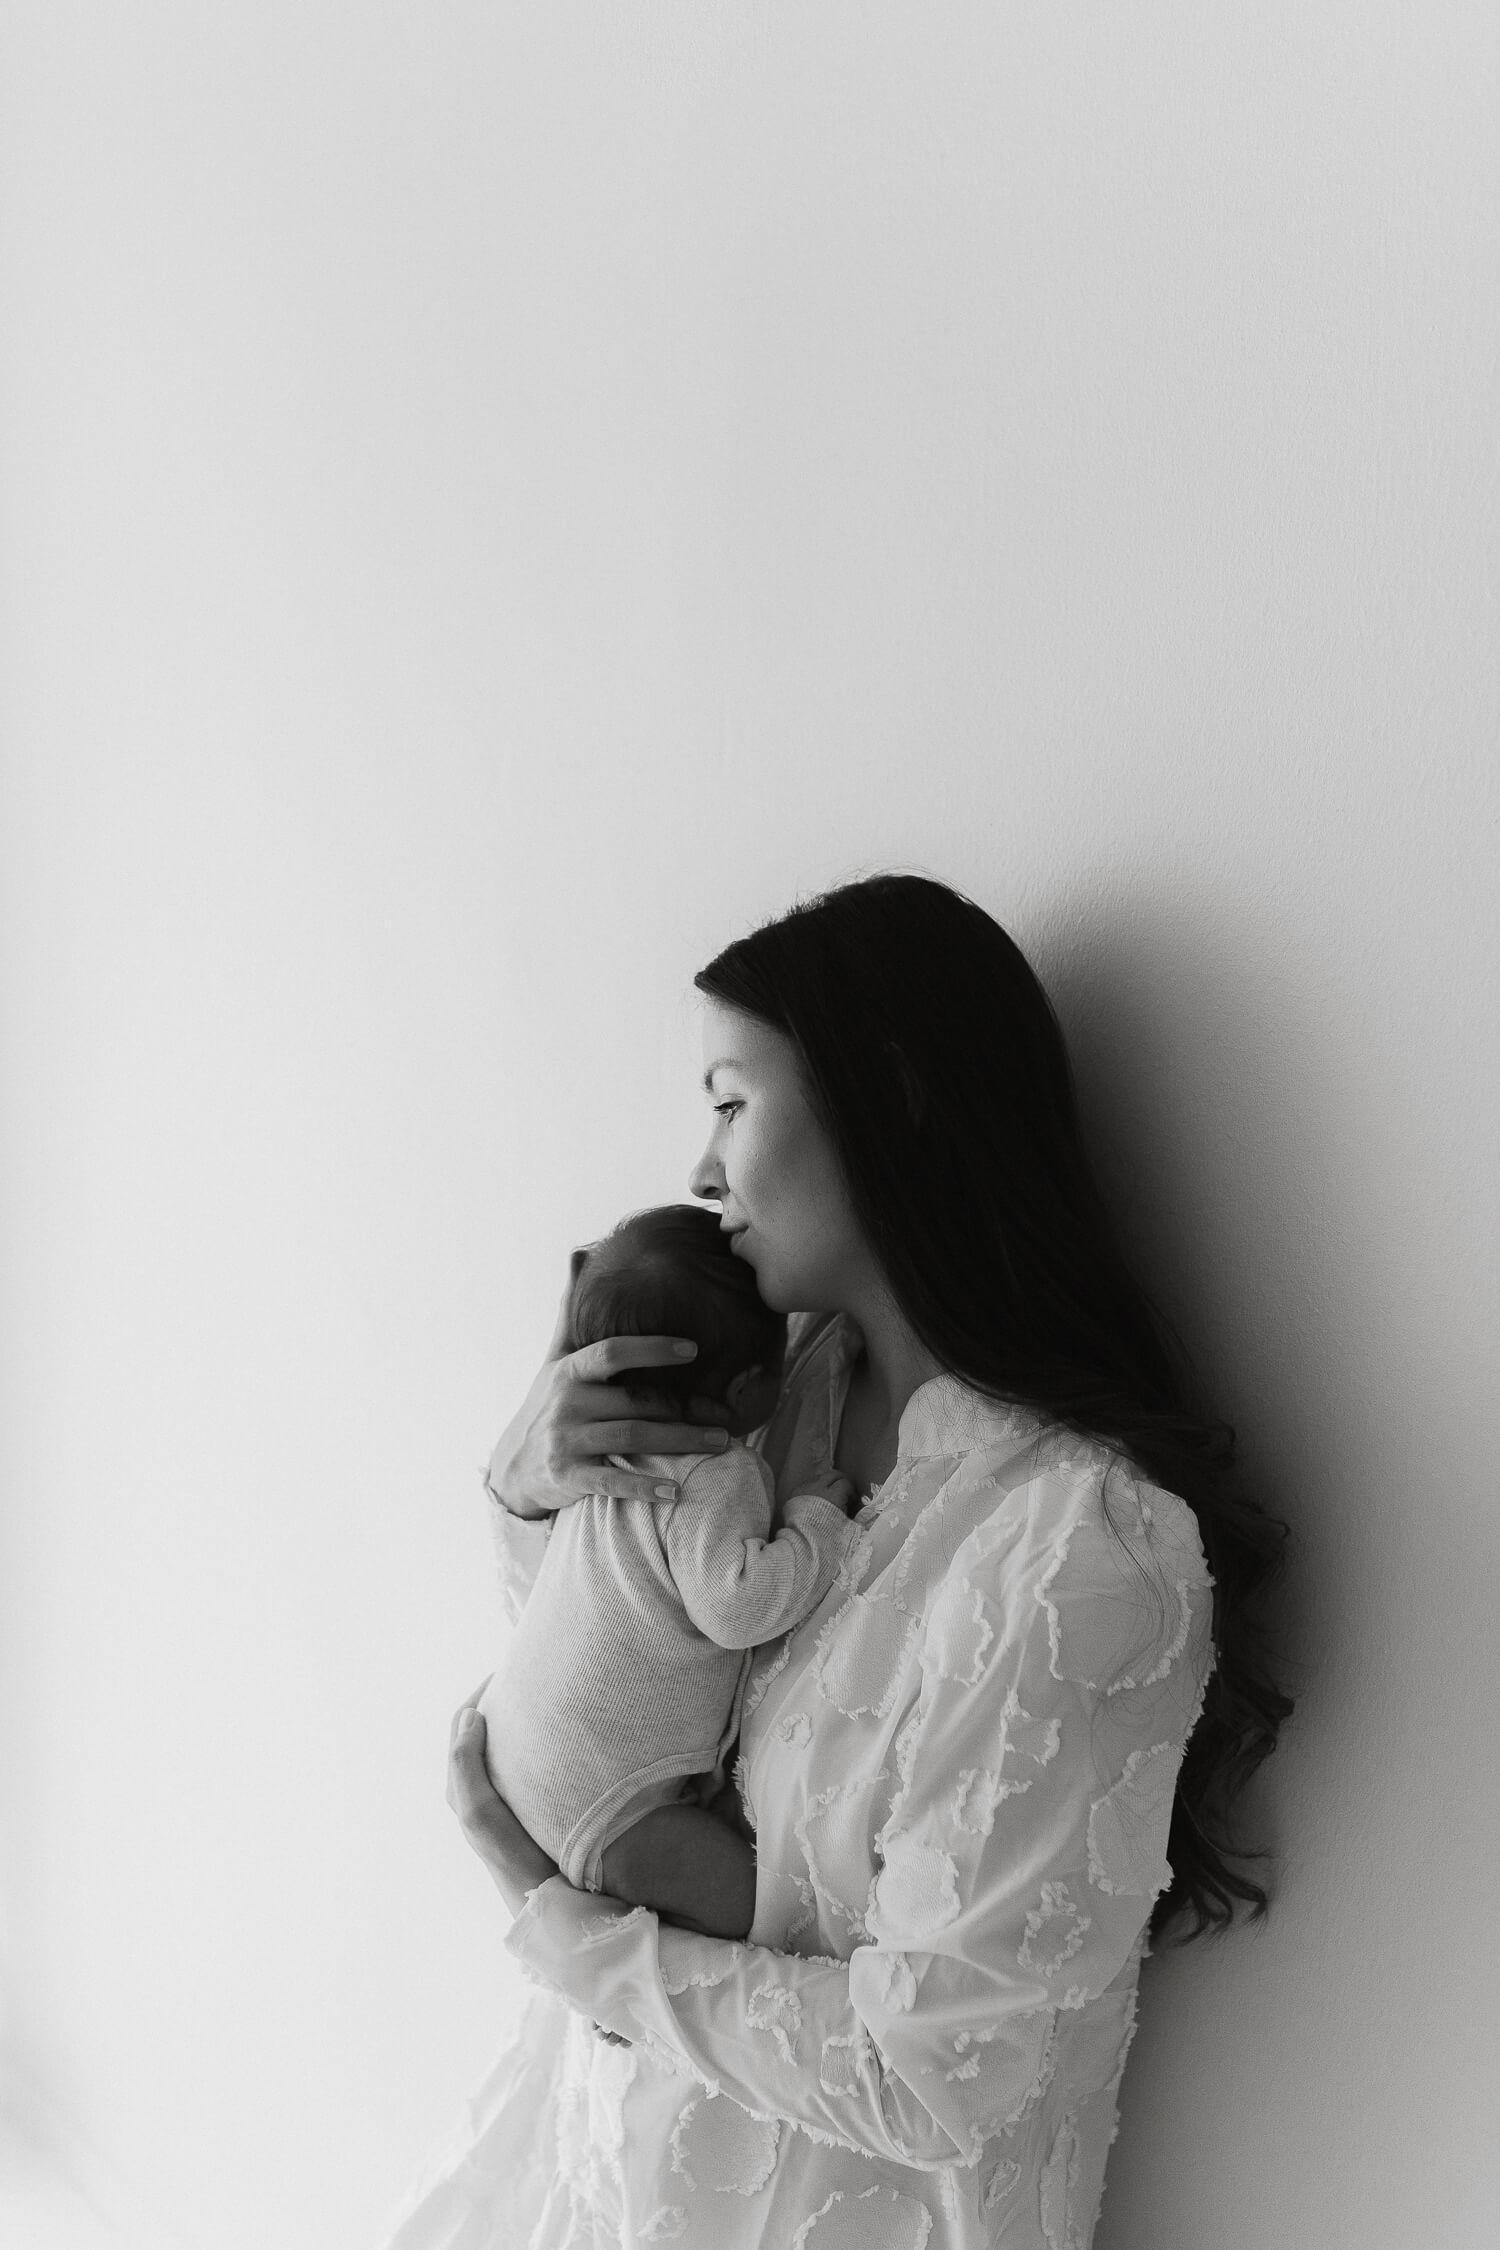 Helia Visuals workshop - ajatonta newbornkuvausta oppimassa. 32